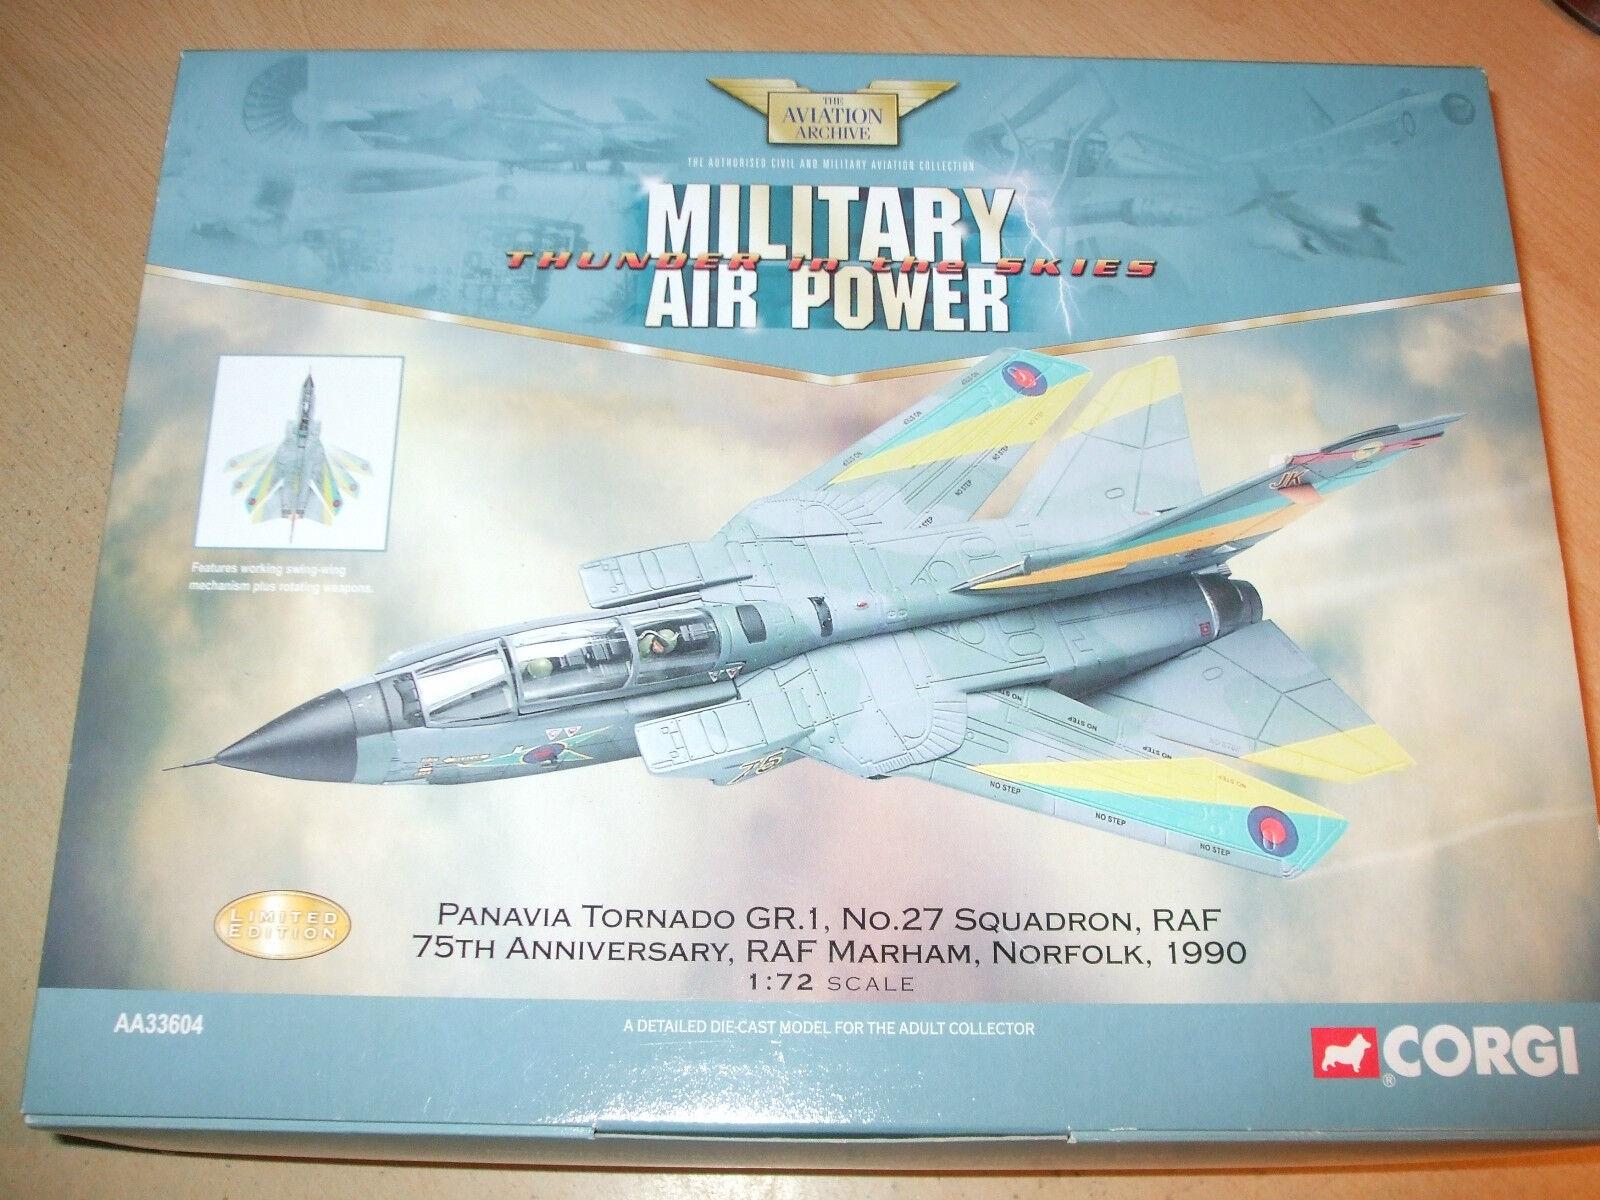 CORGI-Panavia Tornado GR.1, No.27 SQD. - RAF 75th ANNIVERSARIO - 1.72 - AA33604